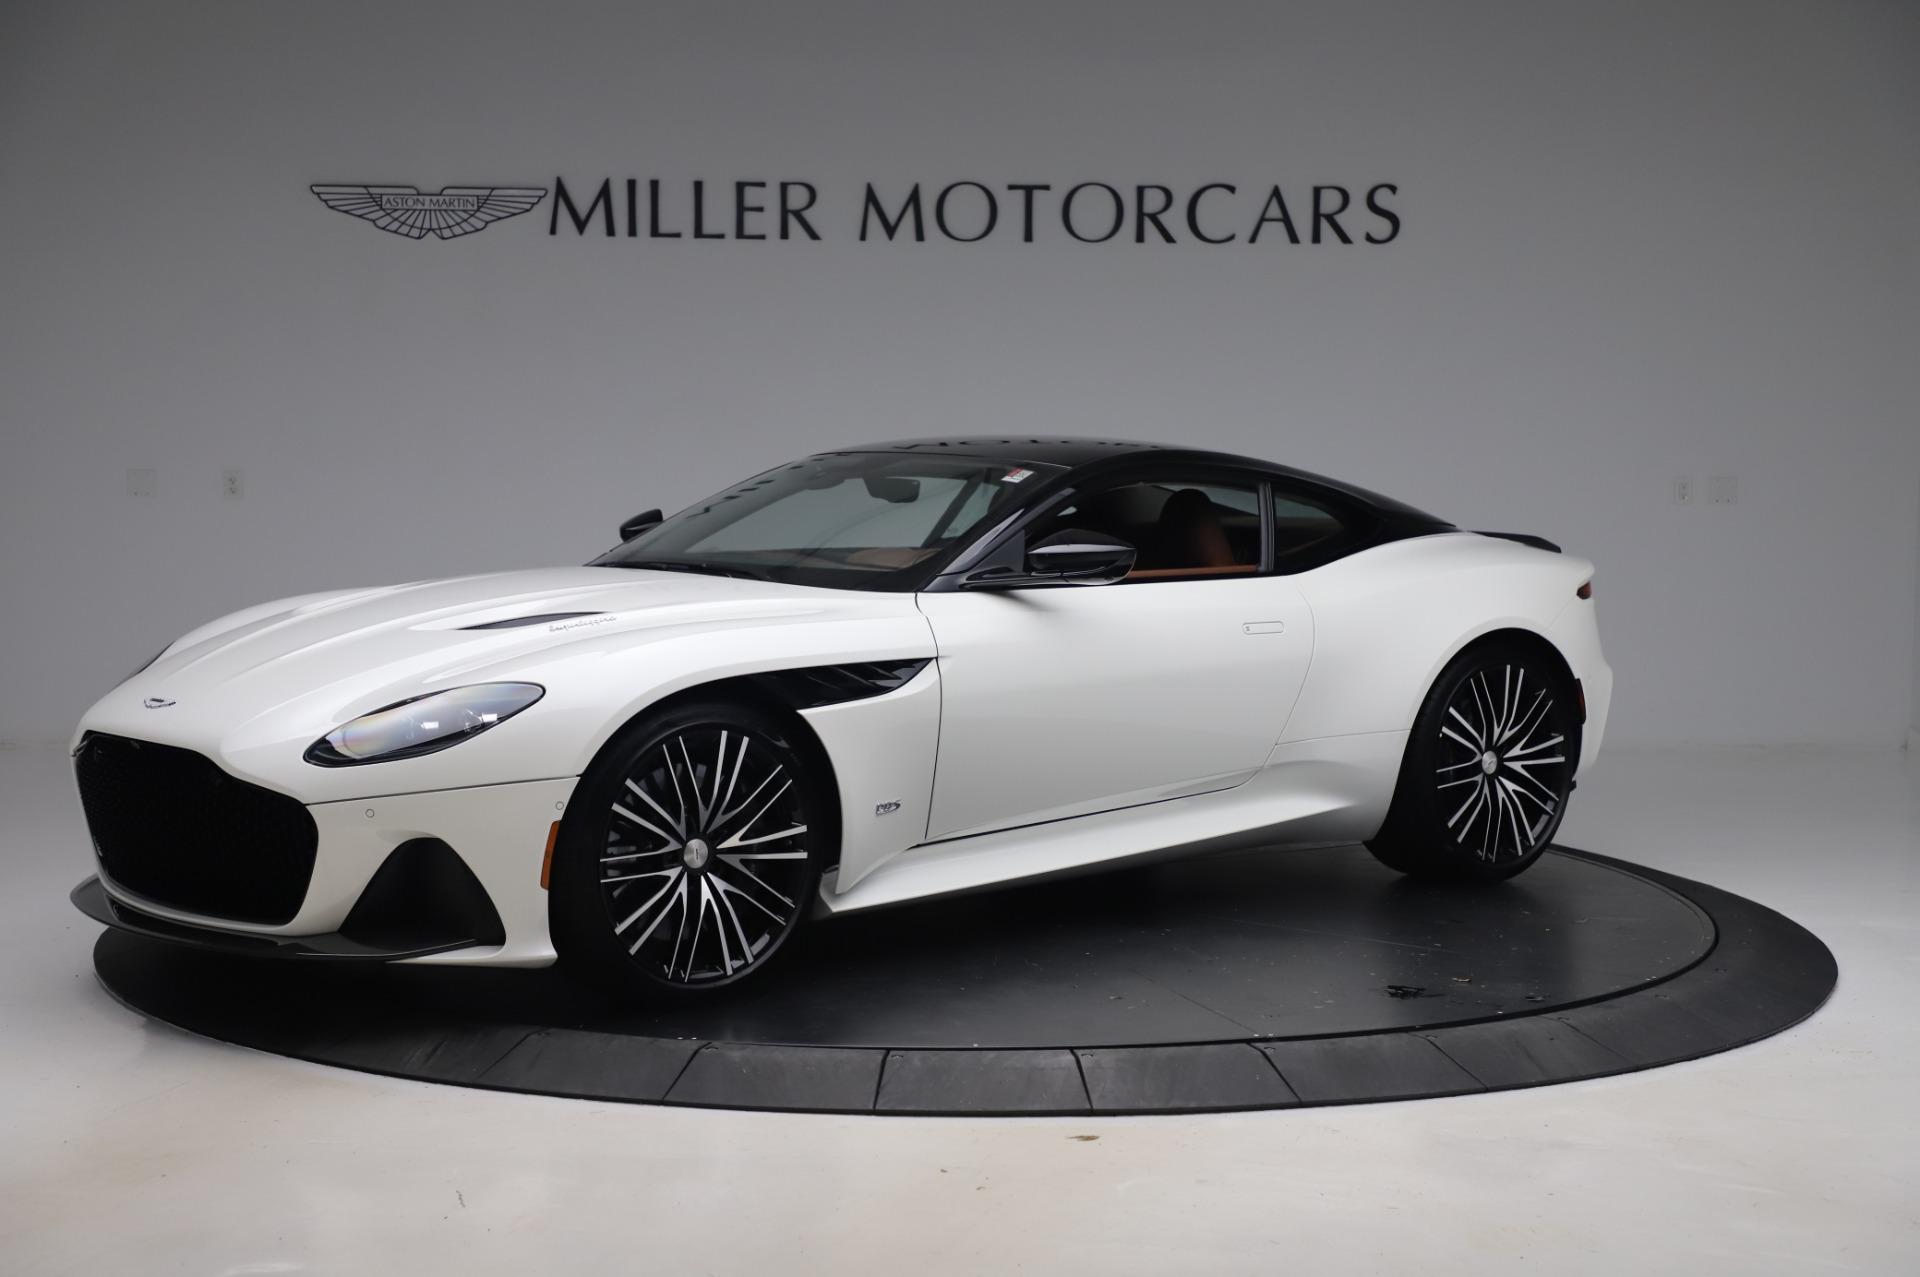 New 2020 Aston Martin DBS Superleggera Coupe for sale $337,686 at Alfa Romeo of Greenwich in Greenwich CT 06830 1